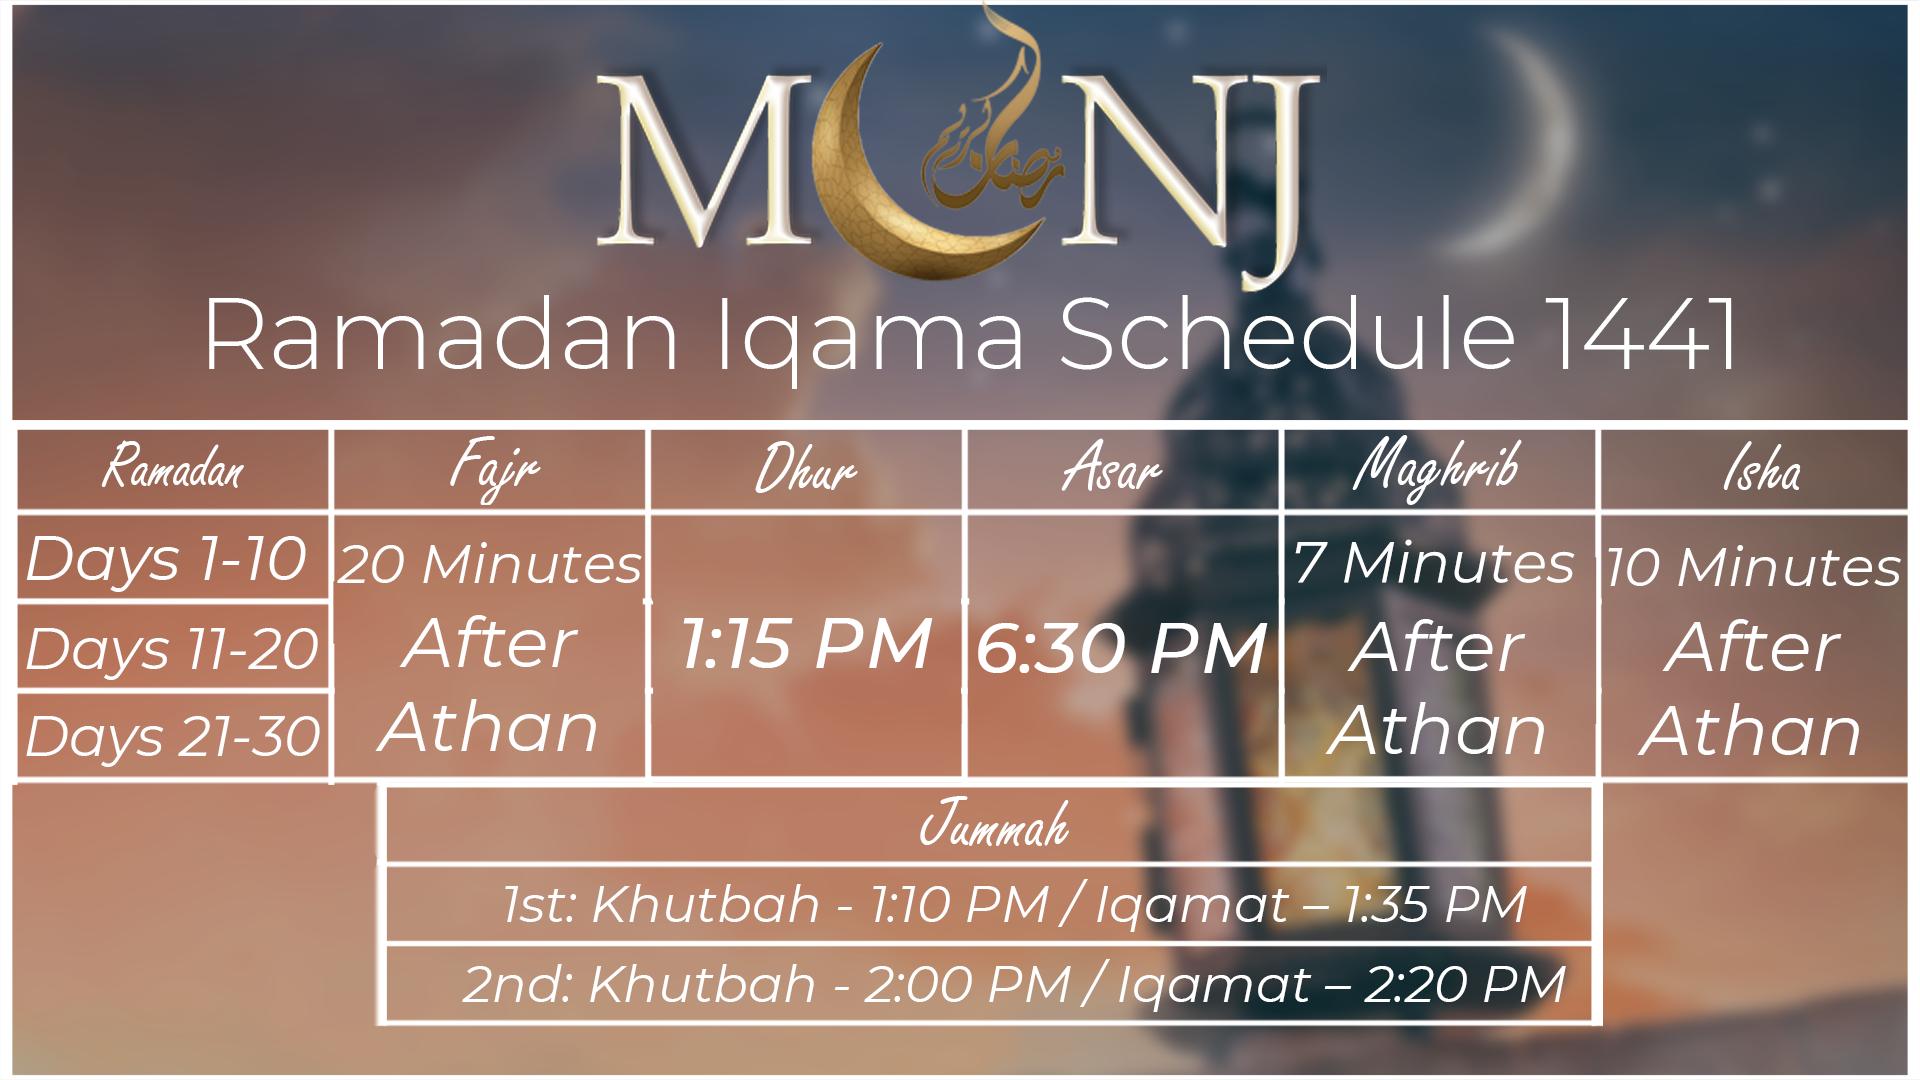 MCNJ Ramadan Iqama Schedule